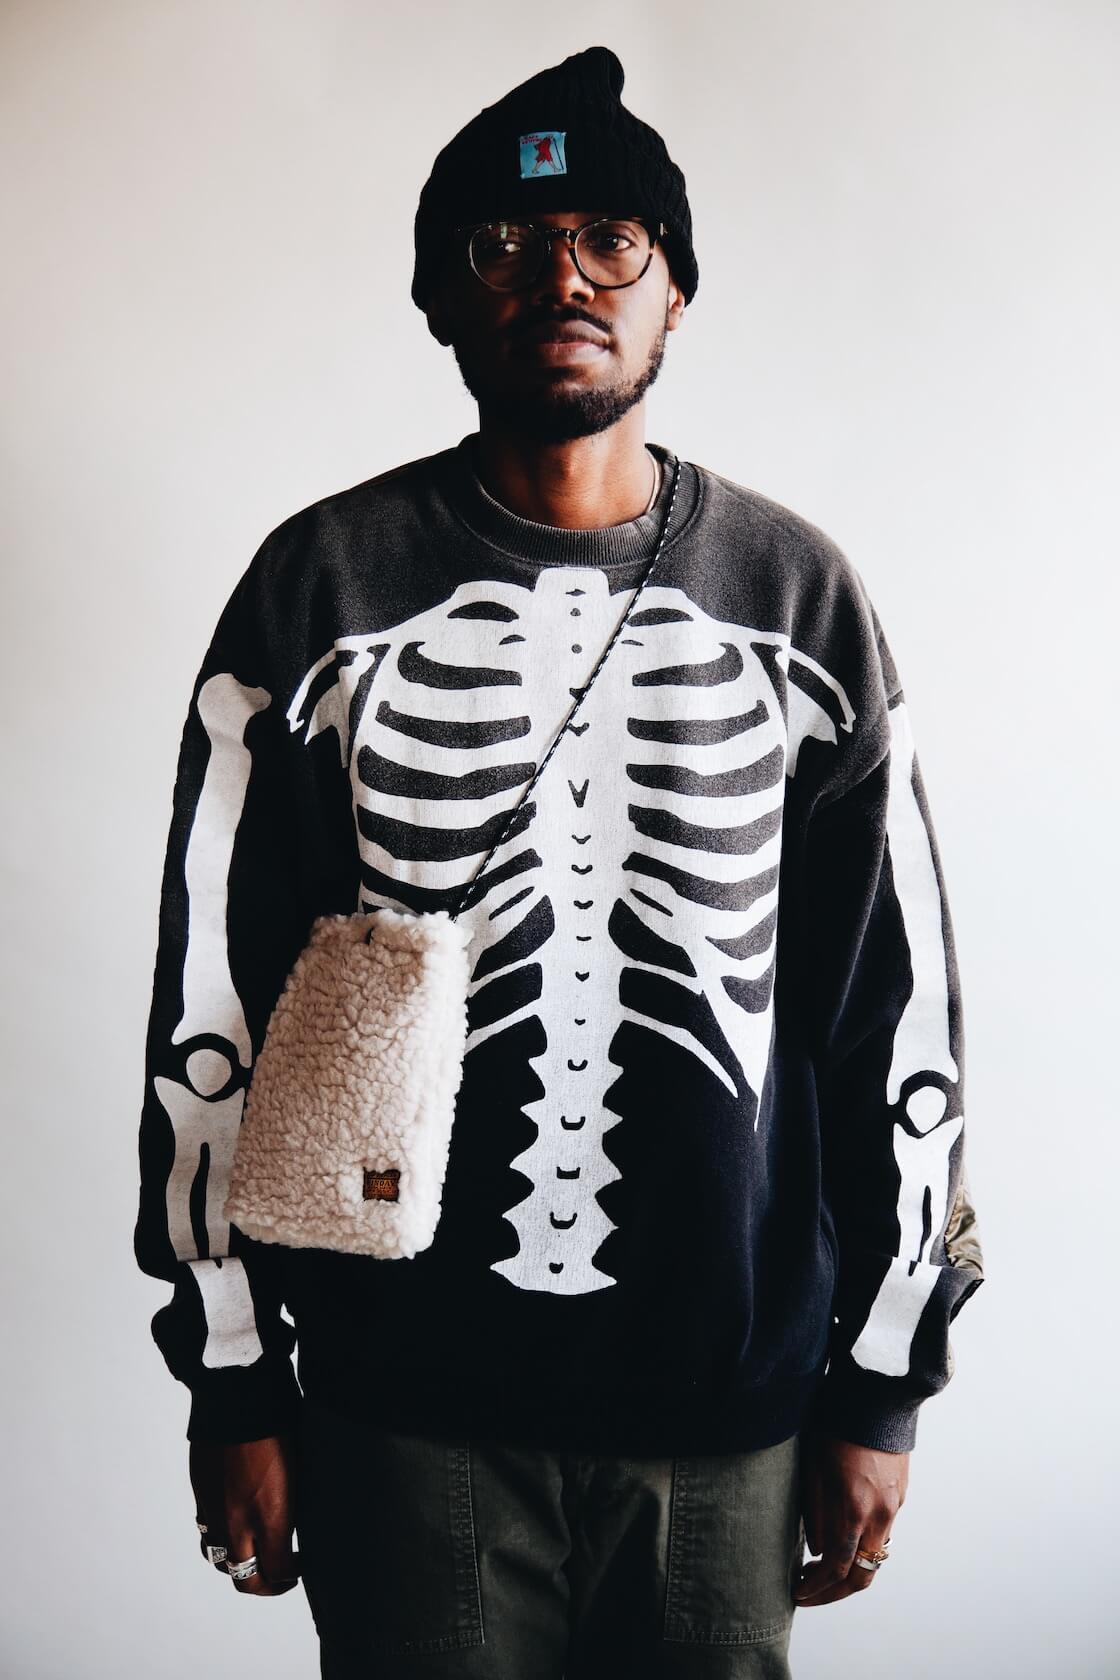 kapital kountry quilted bones sweatshirt on body